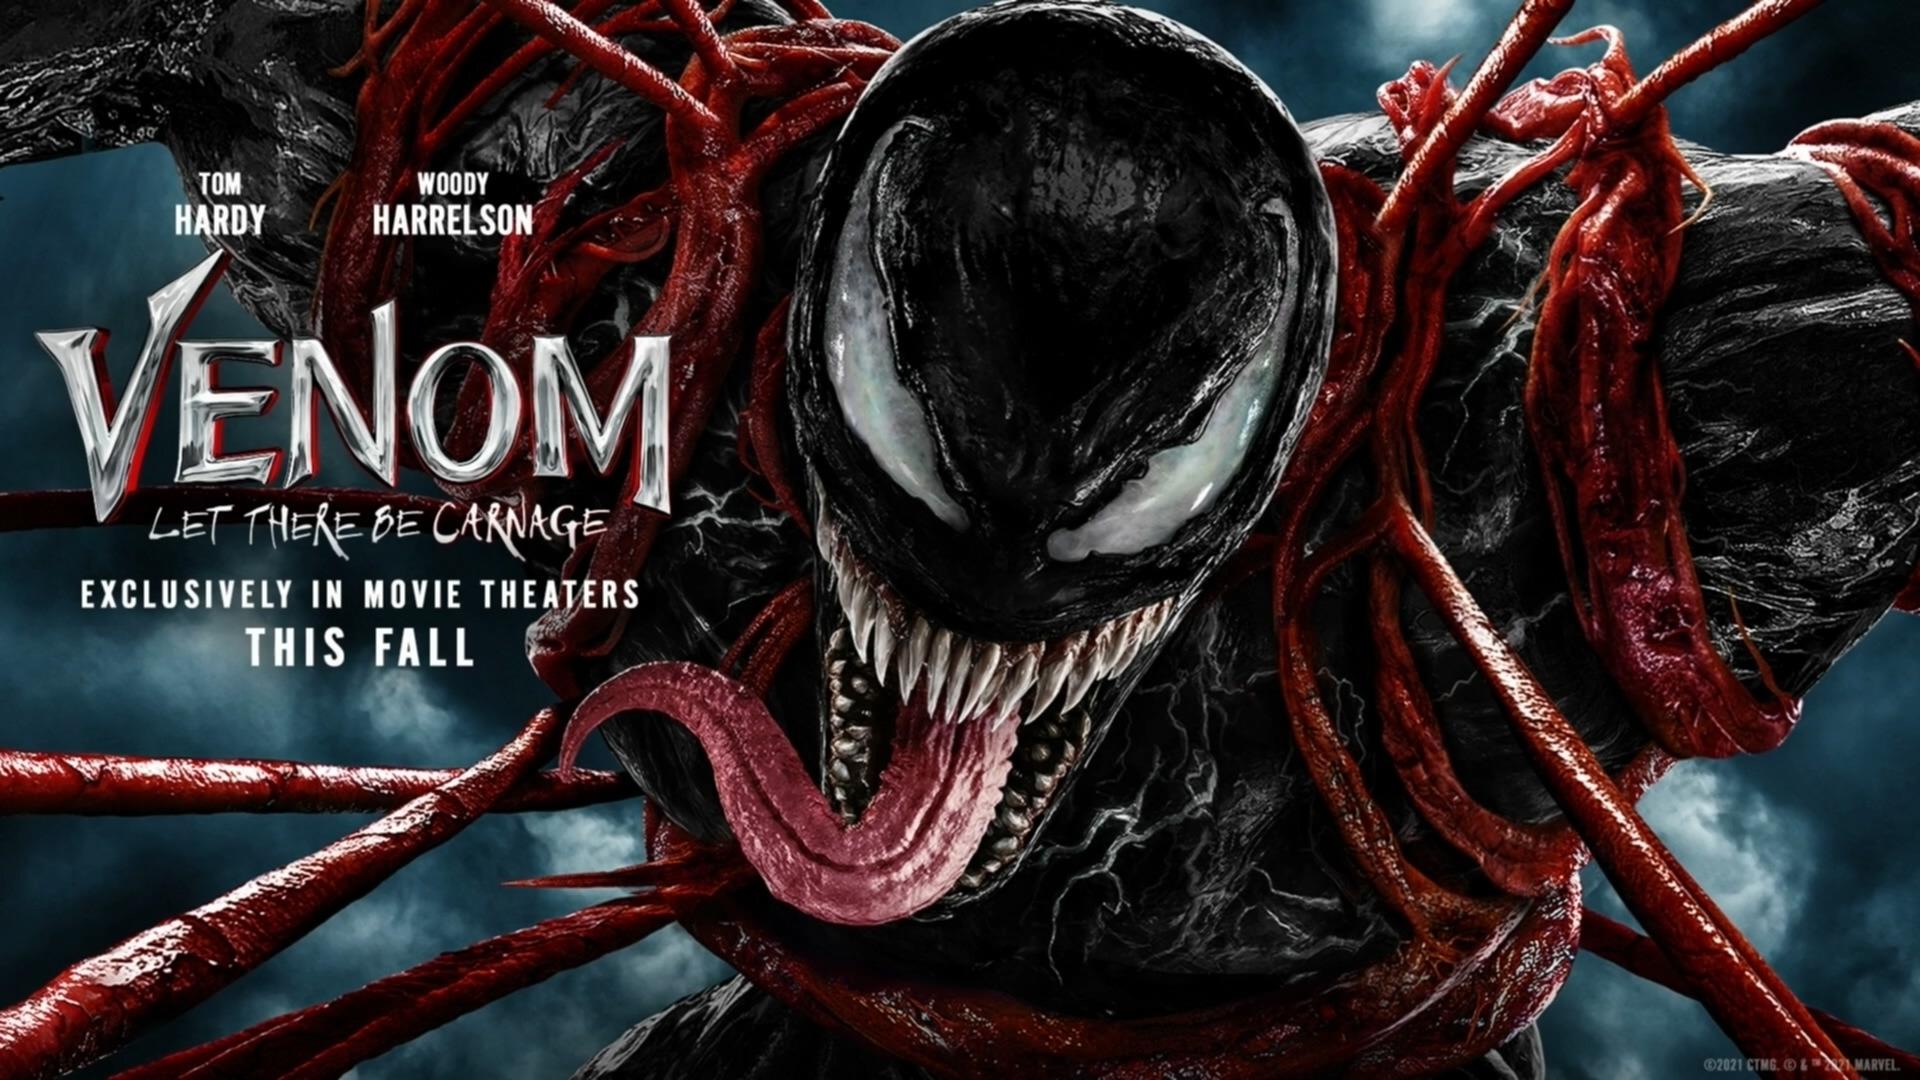 Trailer, Sony, Kino, Kinofilm, Marvel, Sony Pictures, Venom, Venom 2, Let there be Carnage, Carnage